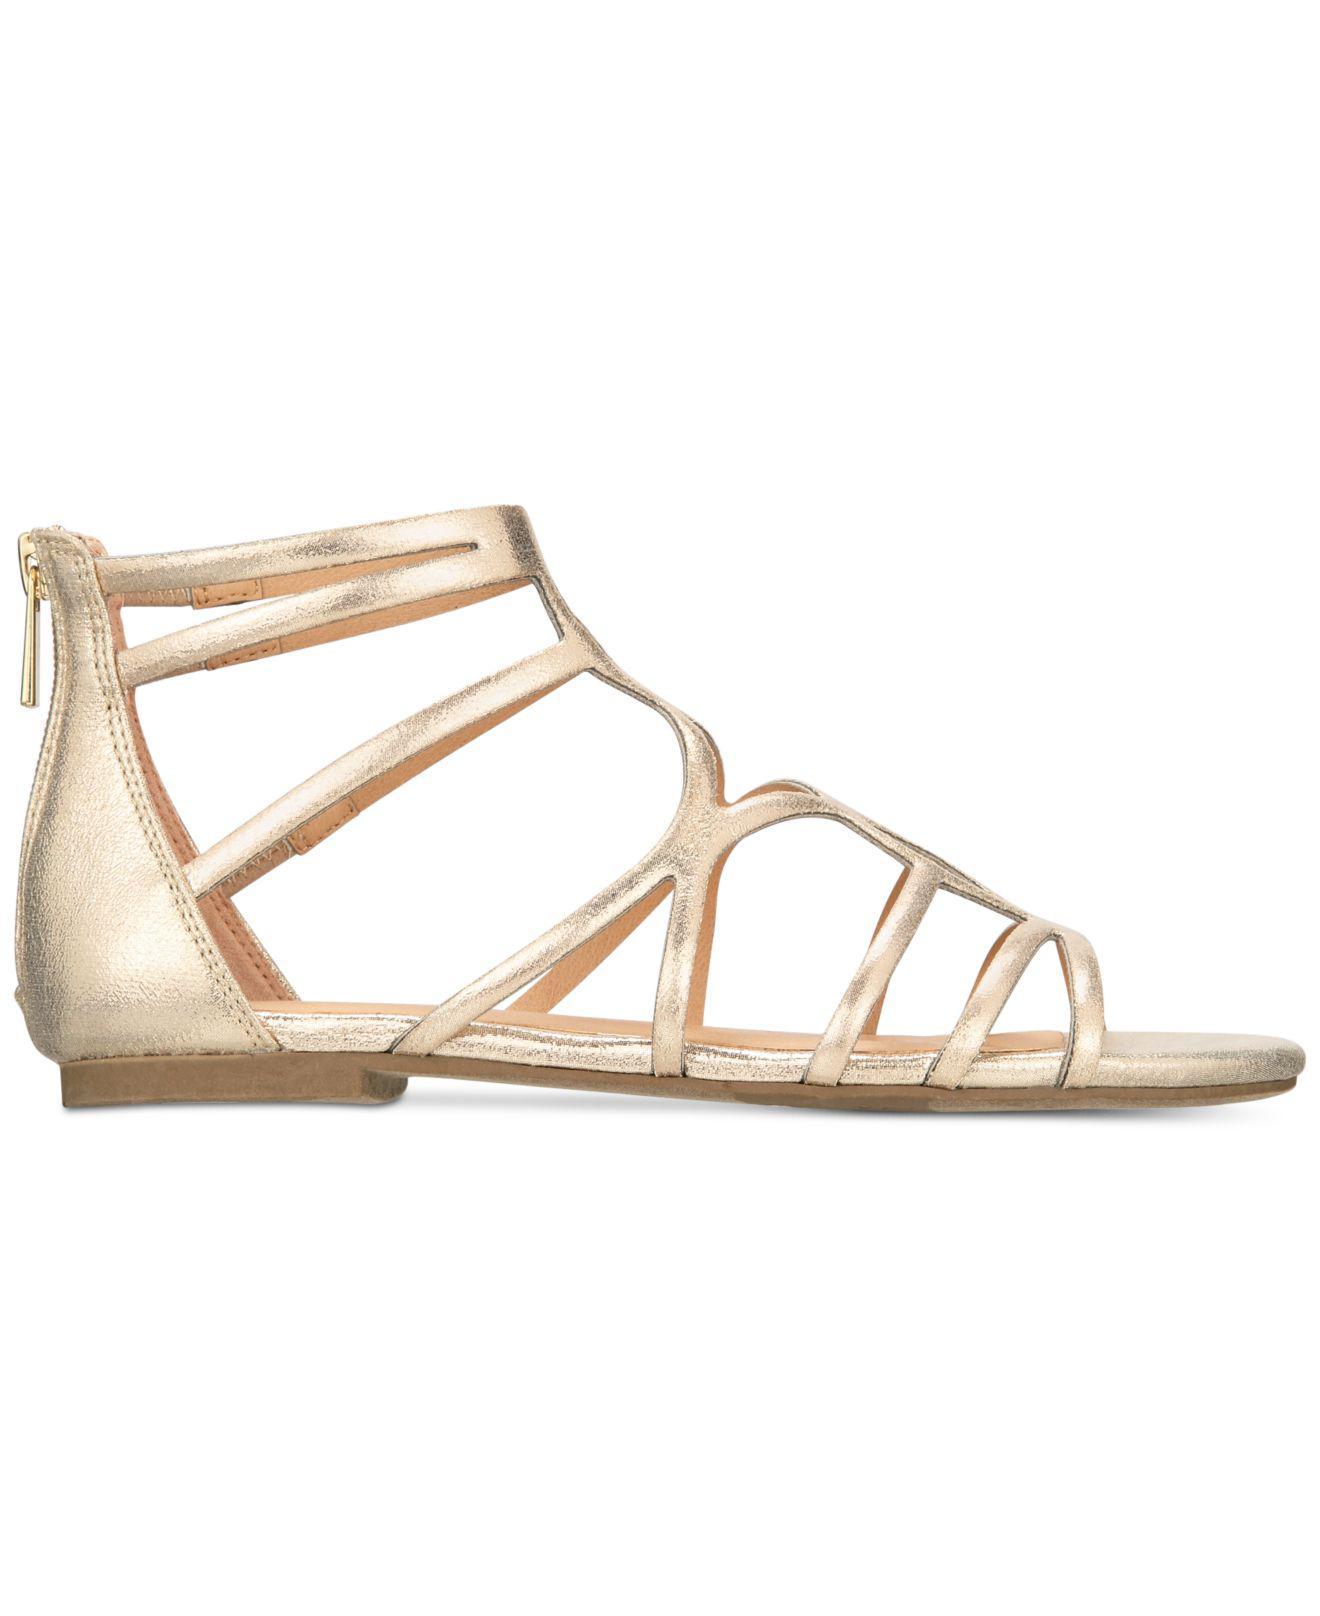 e7b229ebb33c6 Lyst - Material Girl Sira Sandals